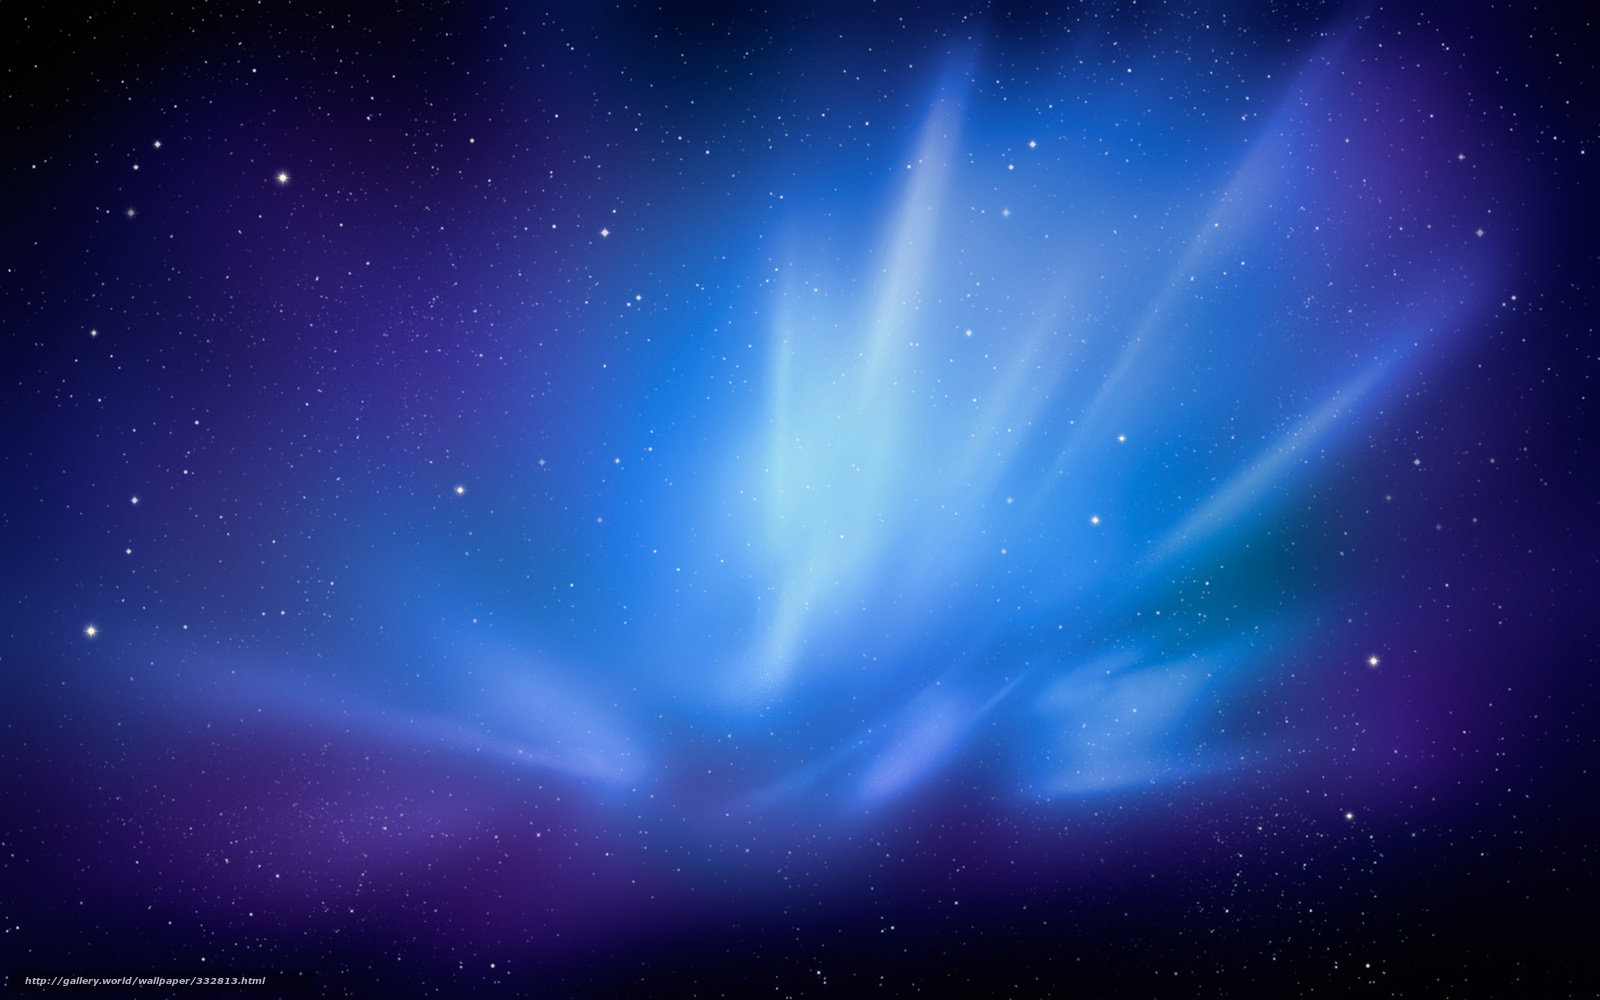 download wallpaper mac mac os macintosh free desktop